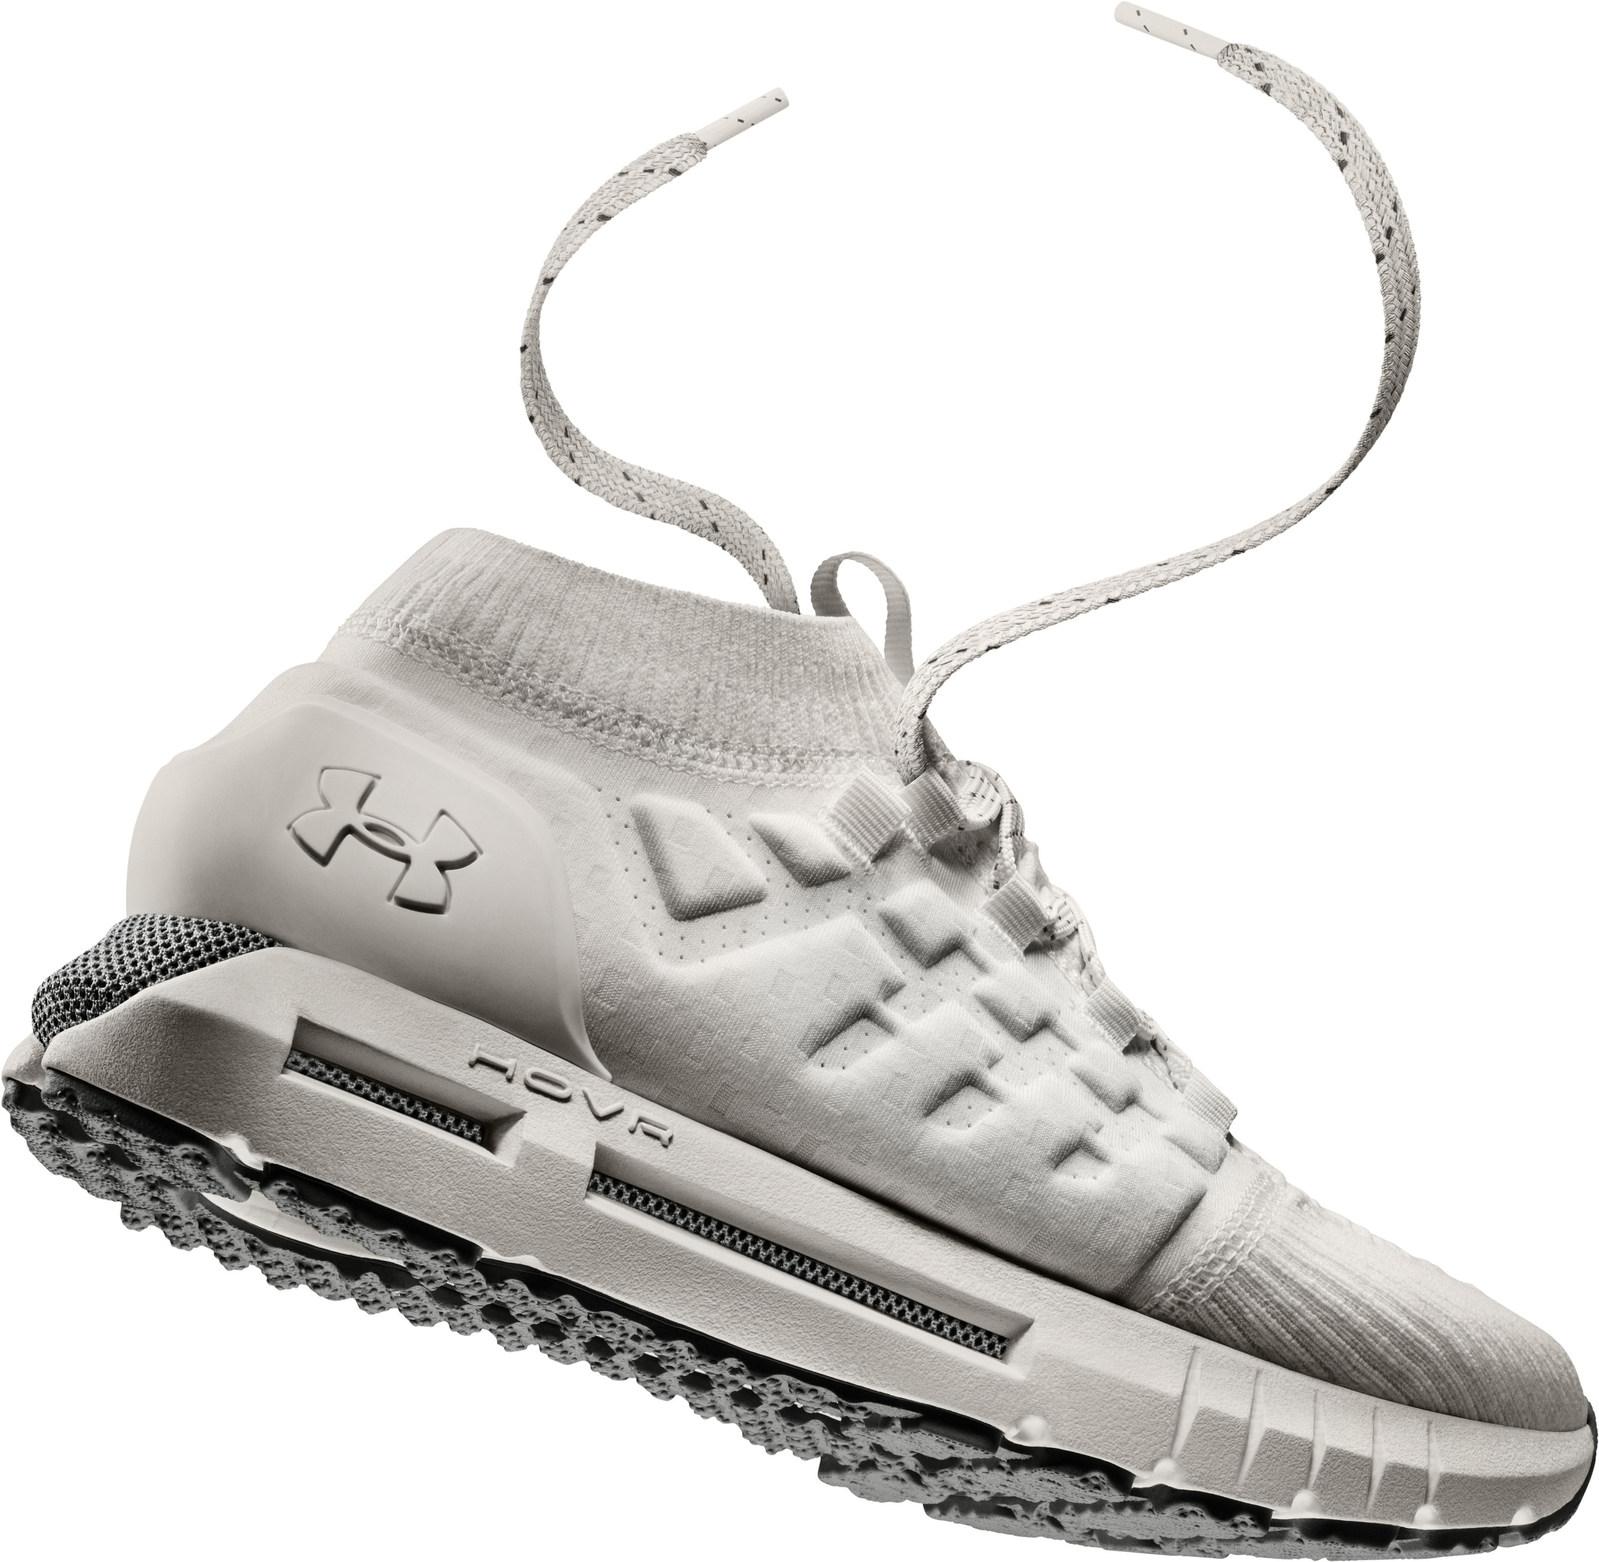 Best Underarmour Running Shoe